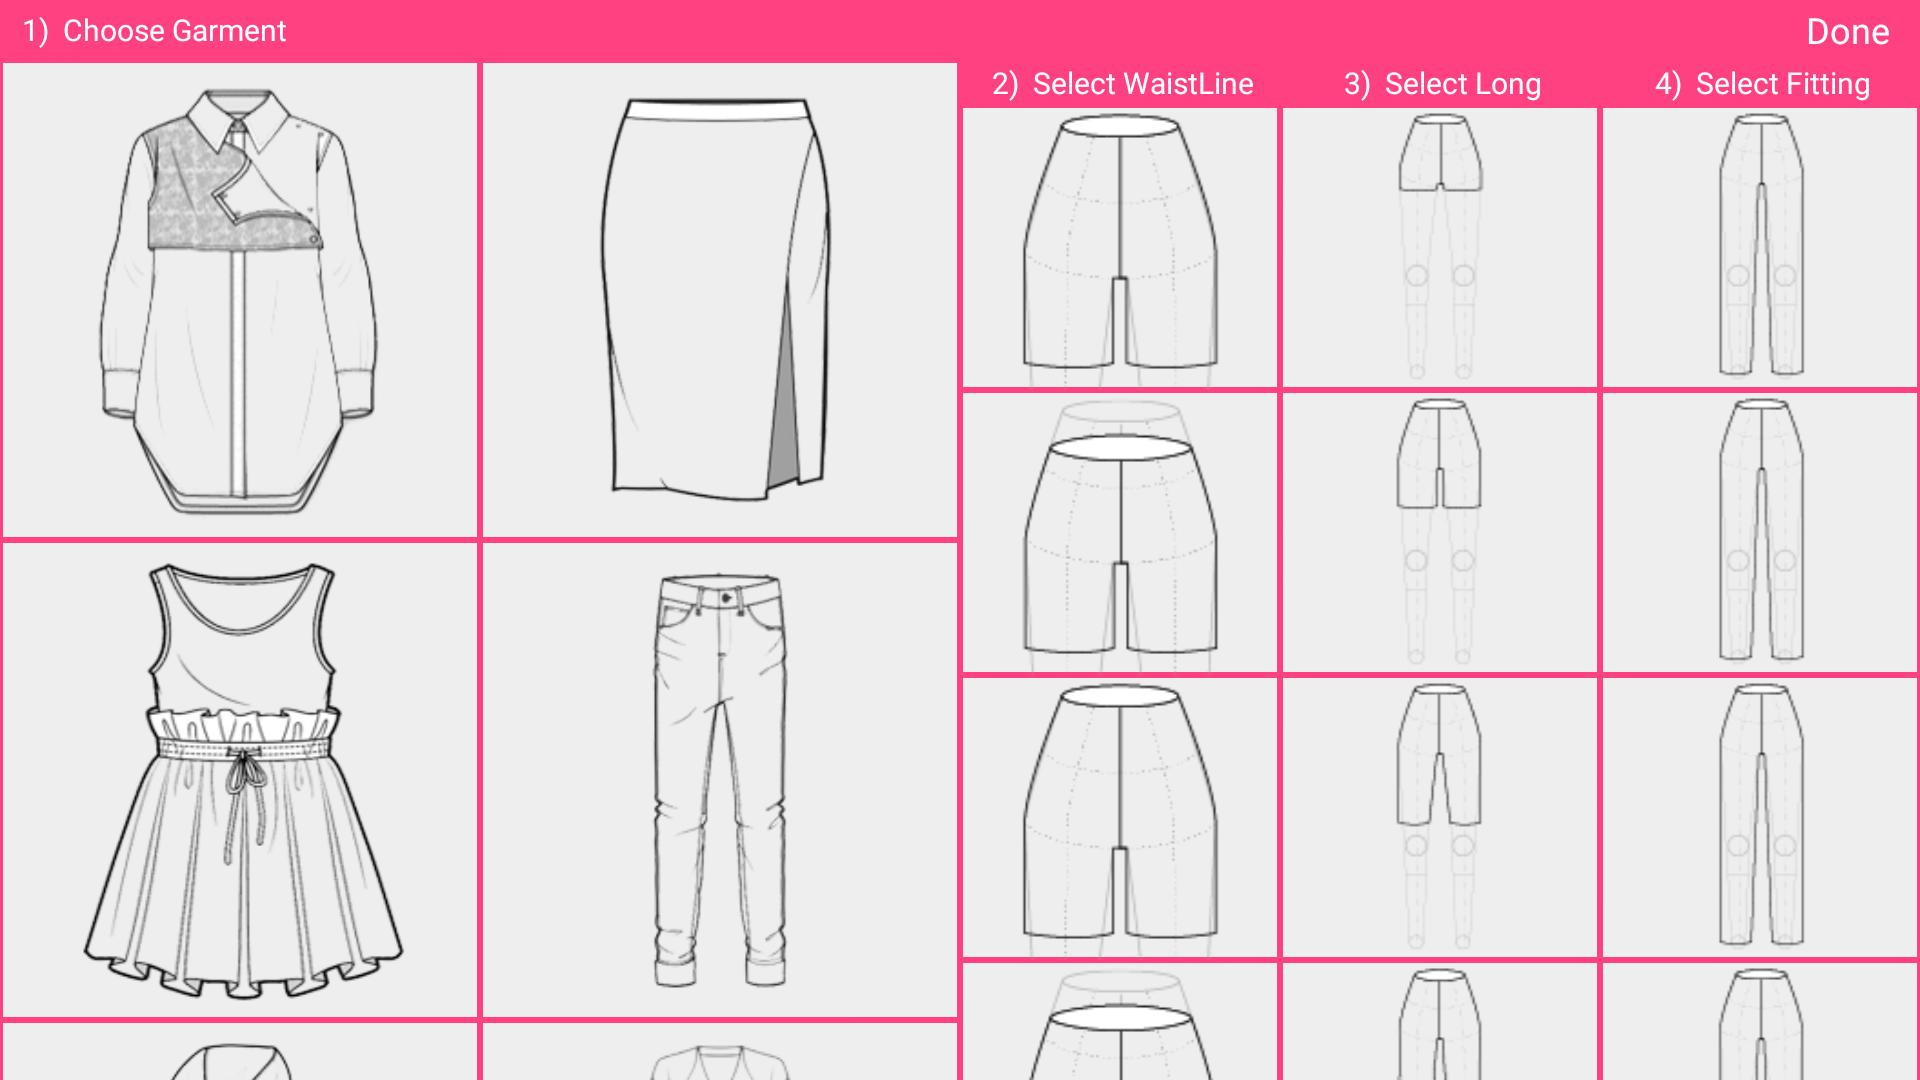 Fashion Design Flat Sketch Fashion Designing App For Android Apk Download